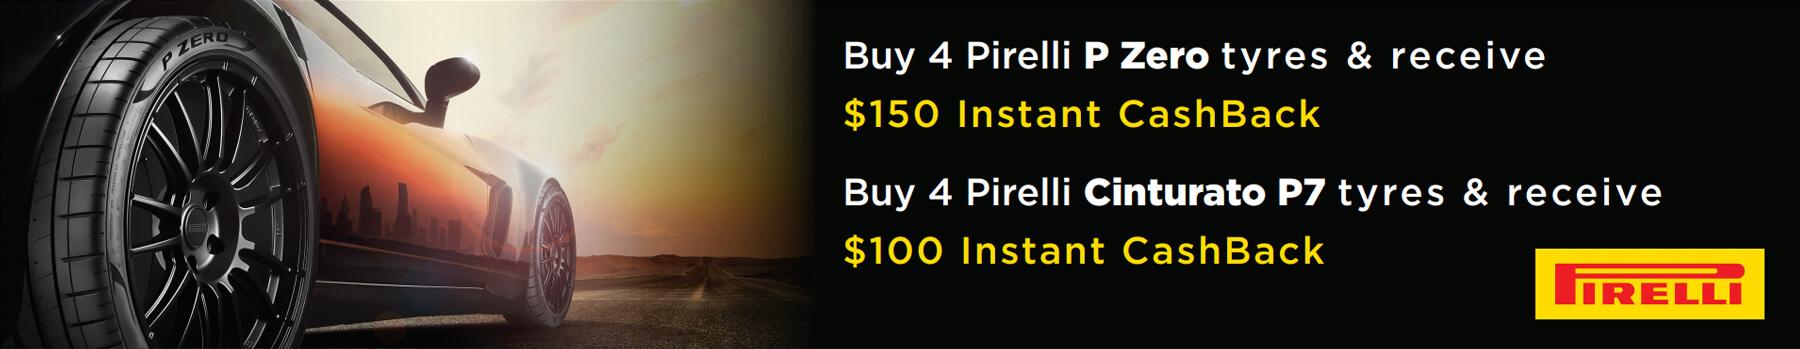 Pirelli Cashback Promotion